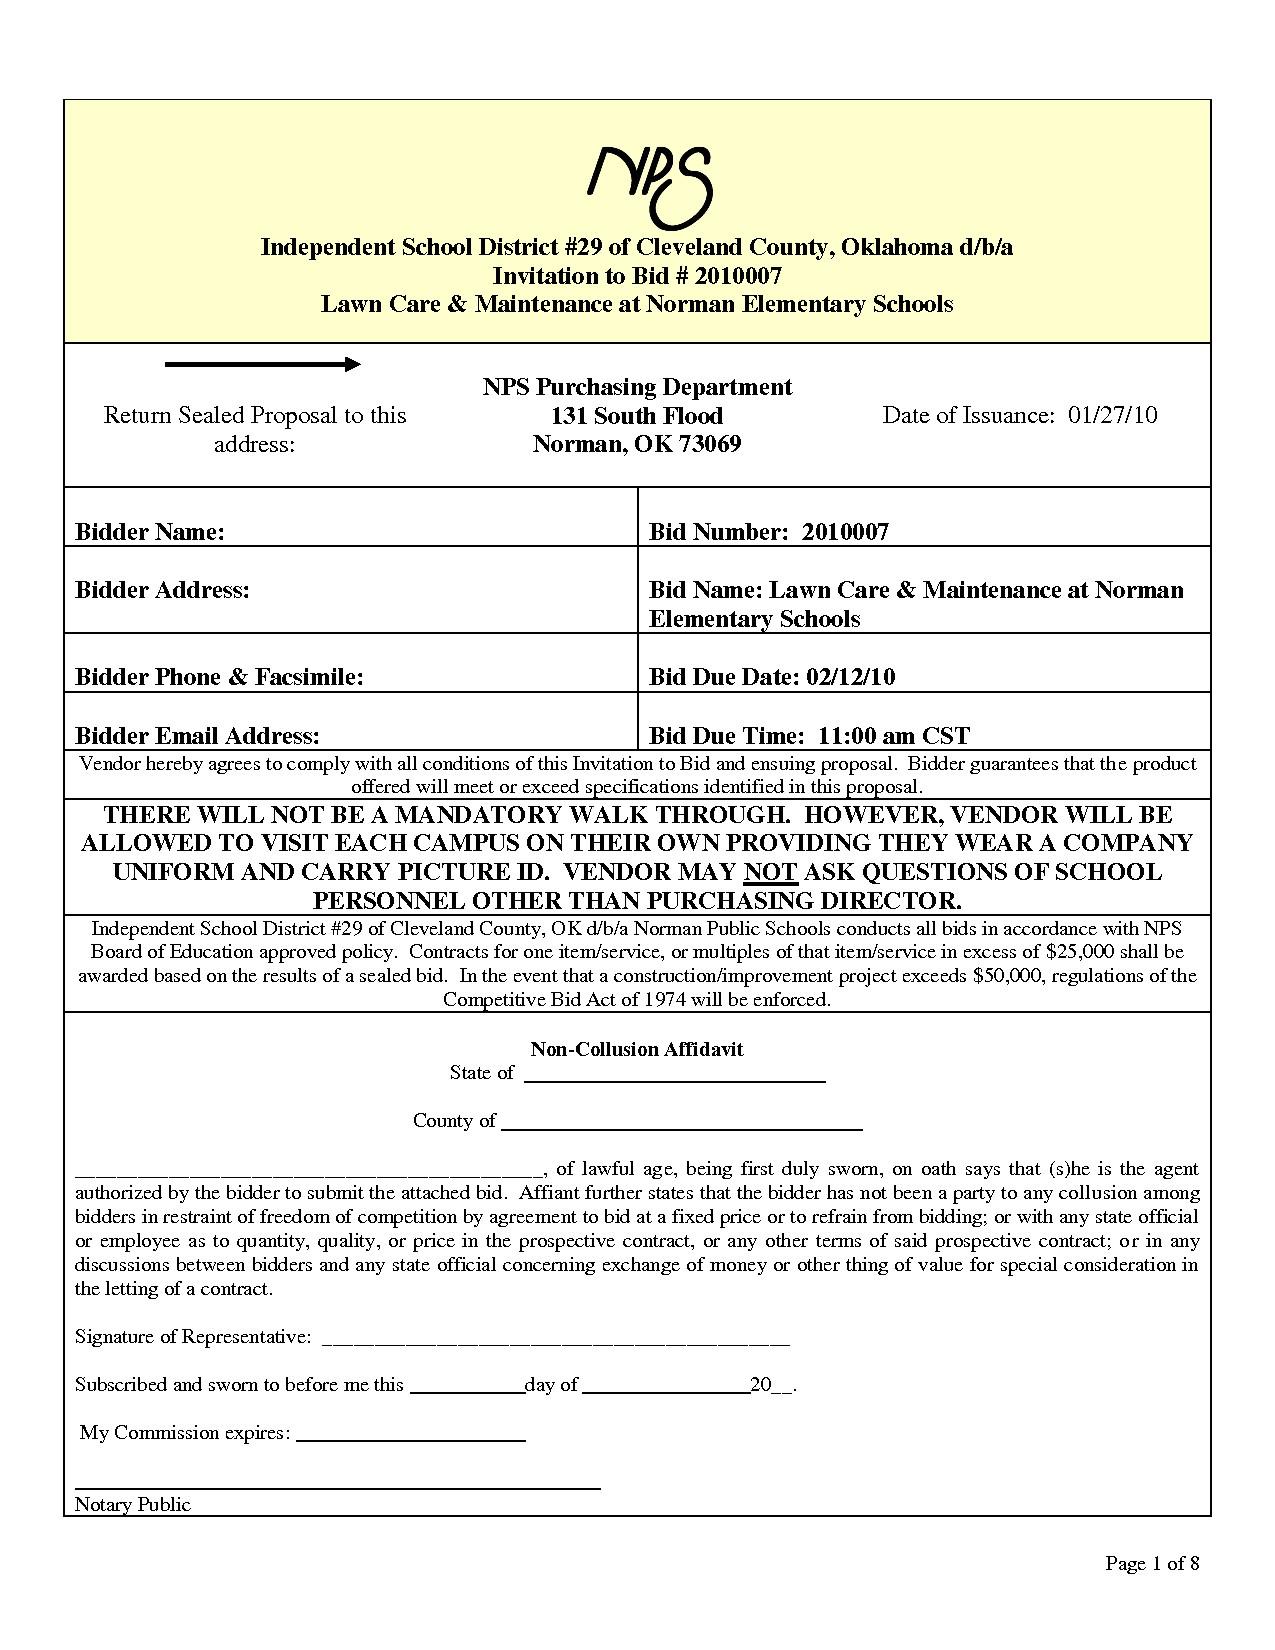 post landscape proposal form 624762